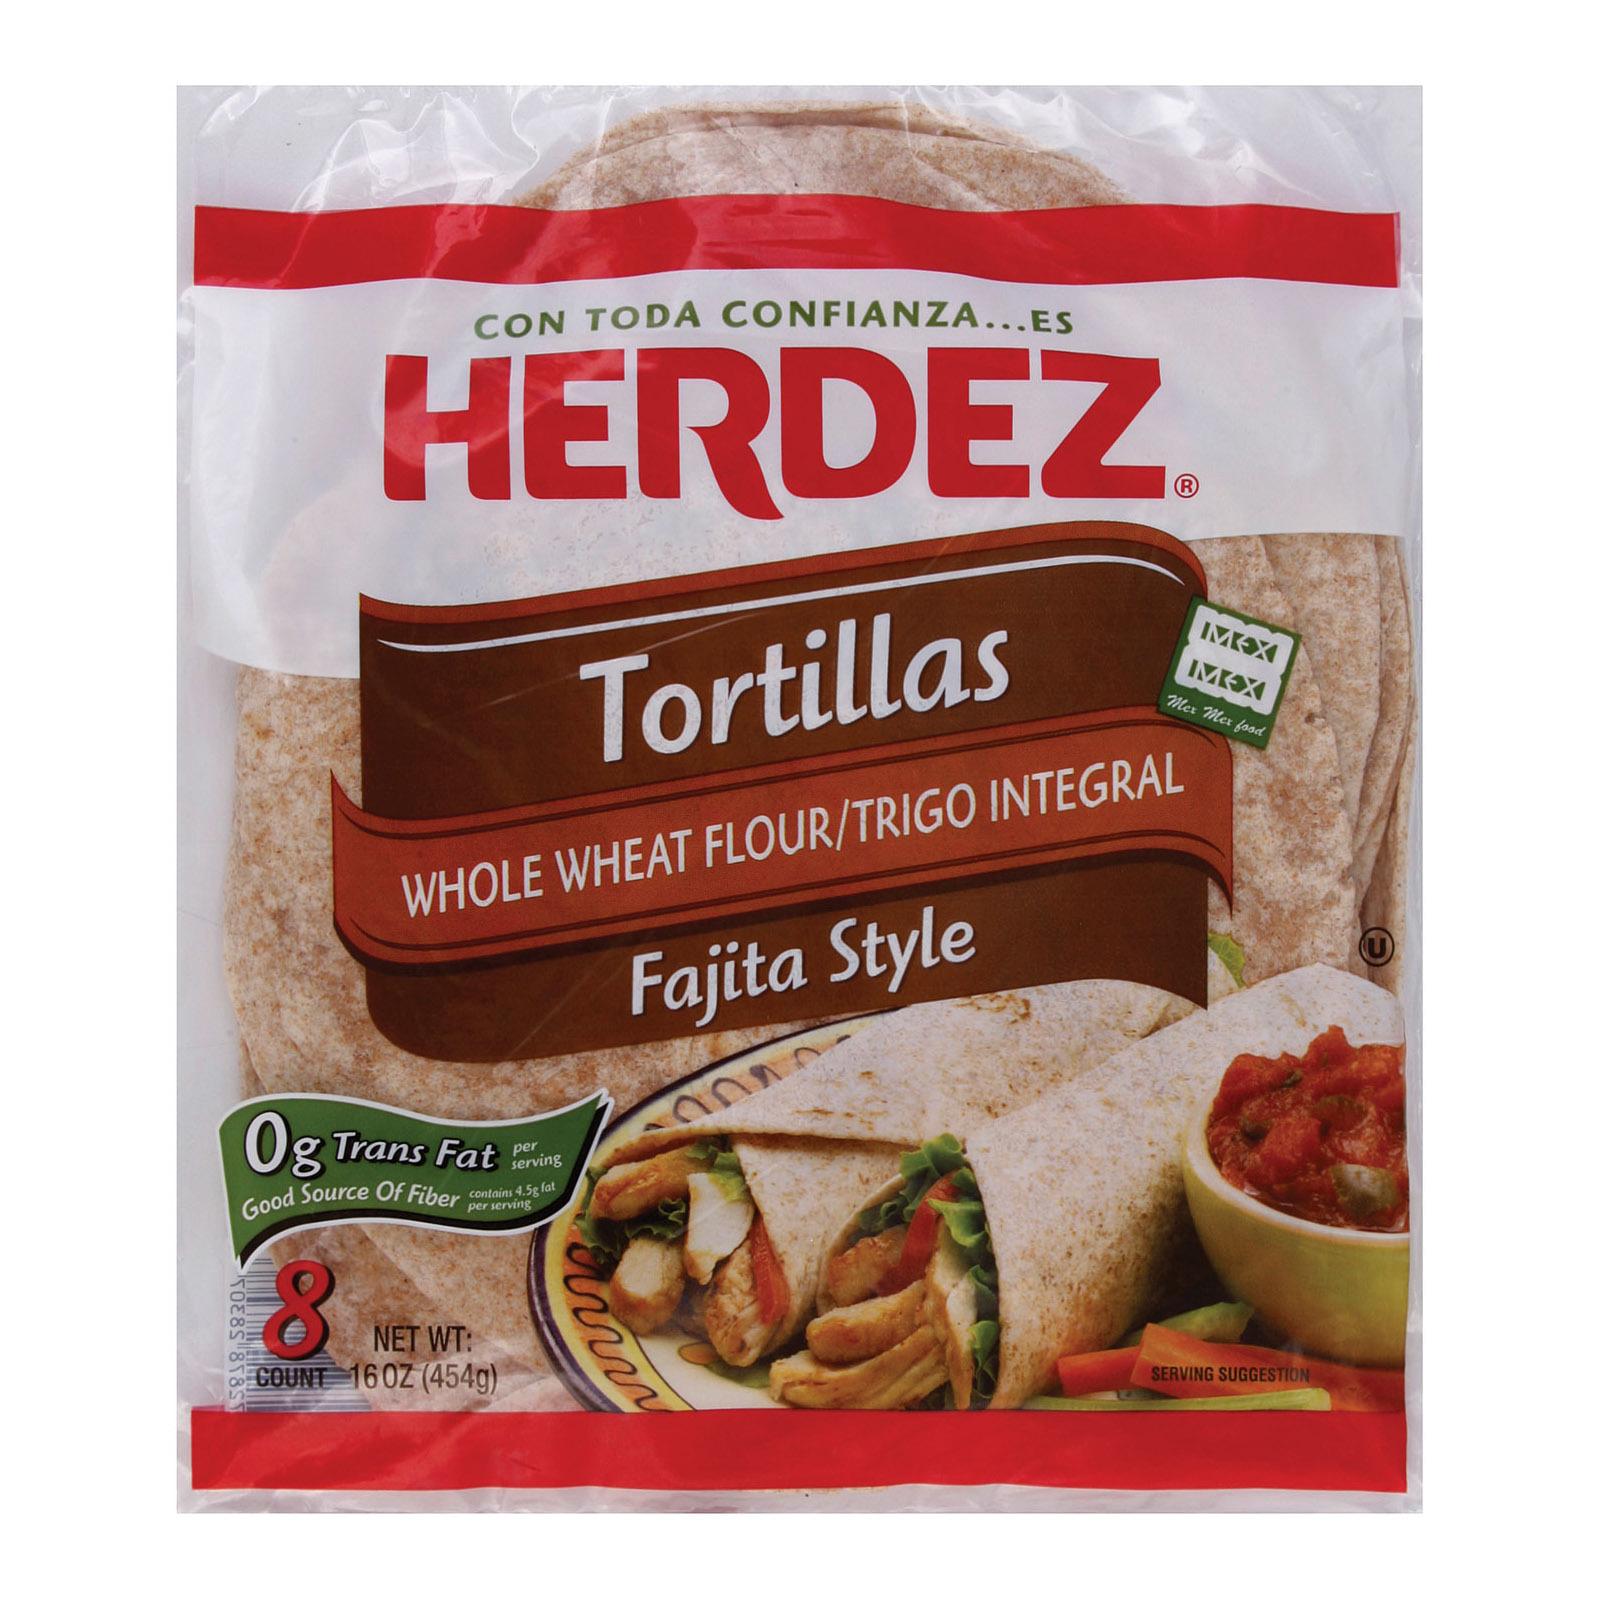 Herdez Tortillas Flour - Fajita Style, Whole Wheat - Case of 12 - 16 oz.